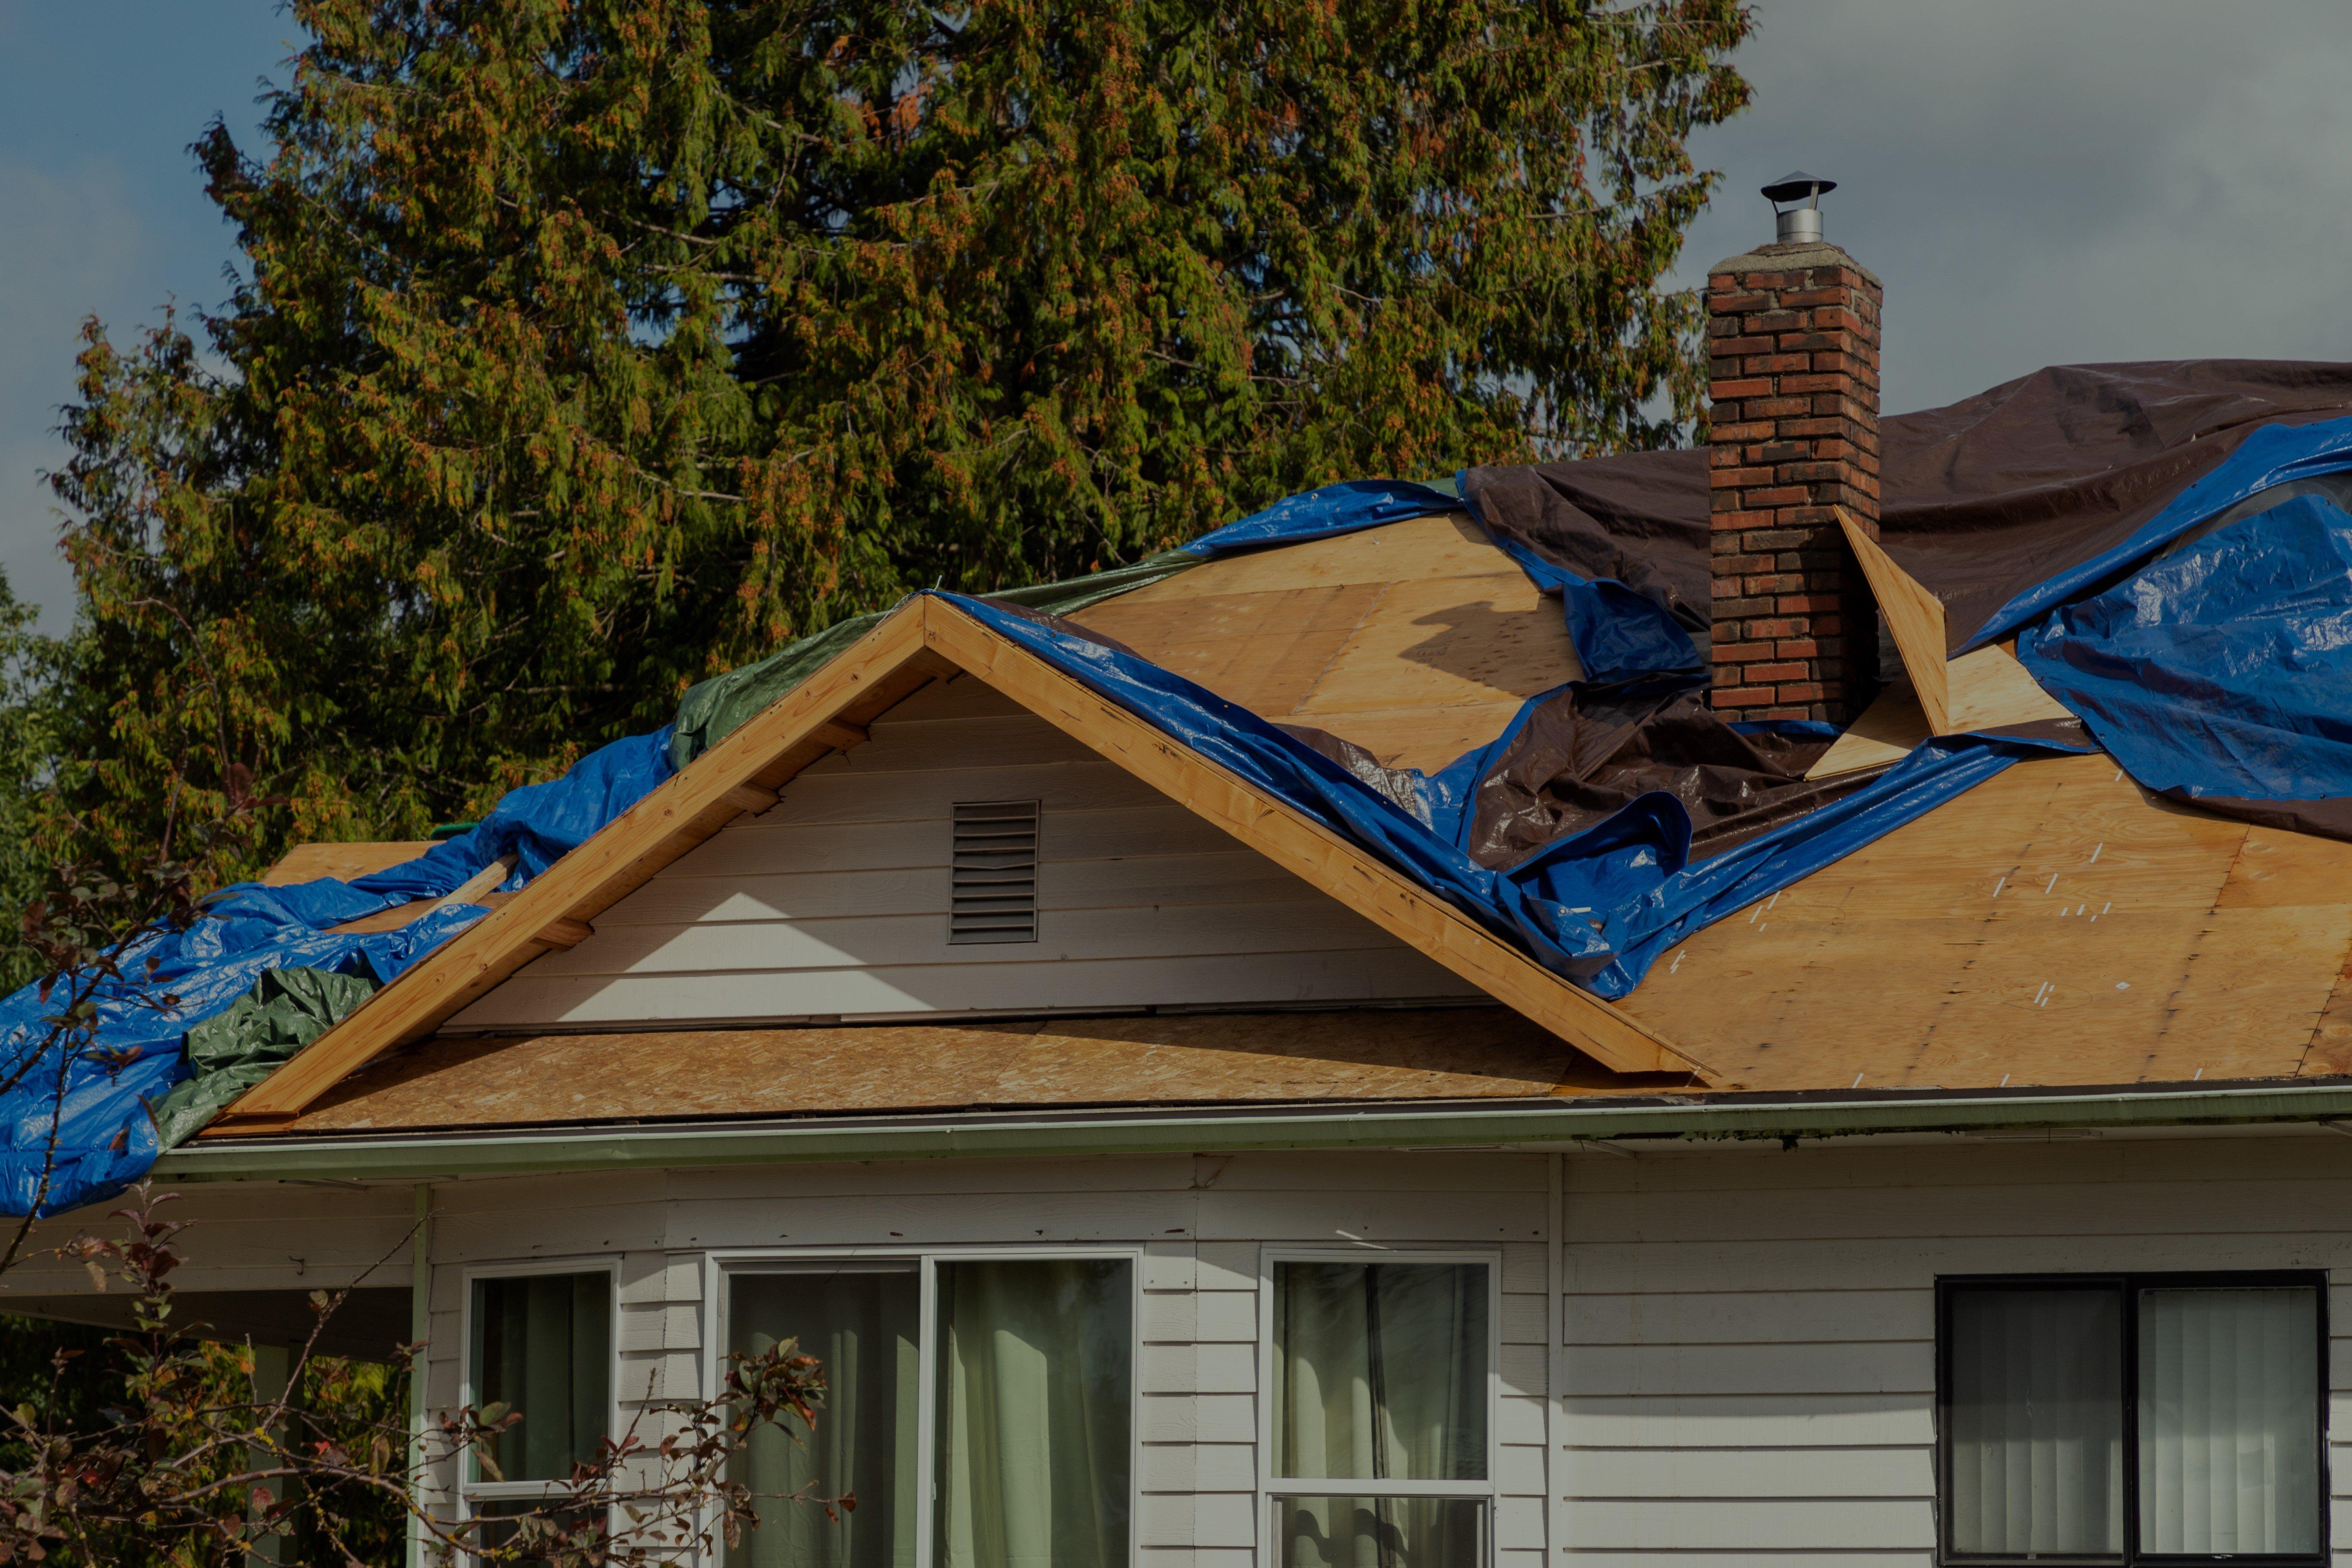 General Home Damage